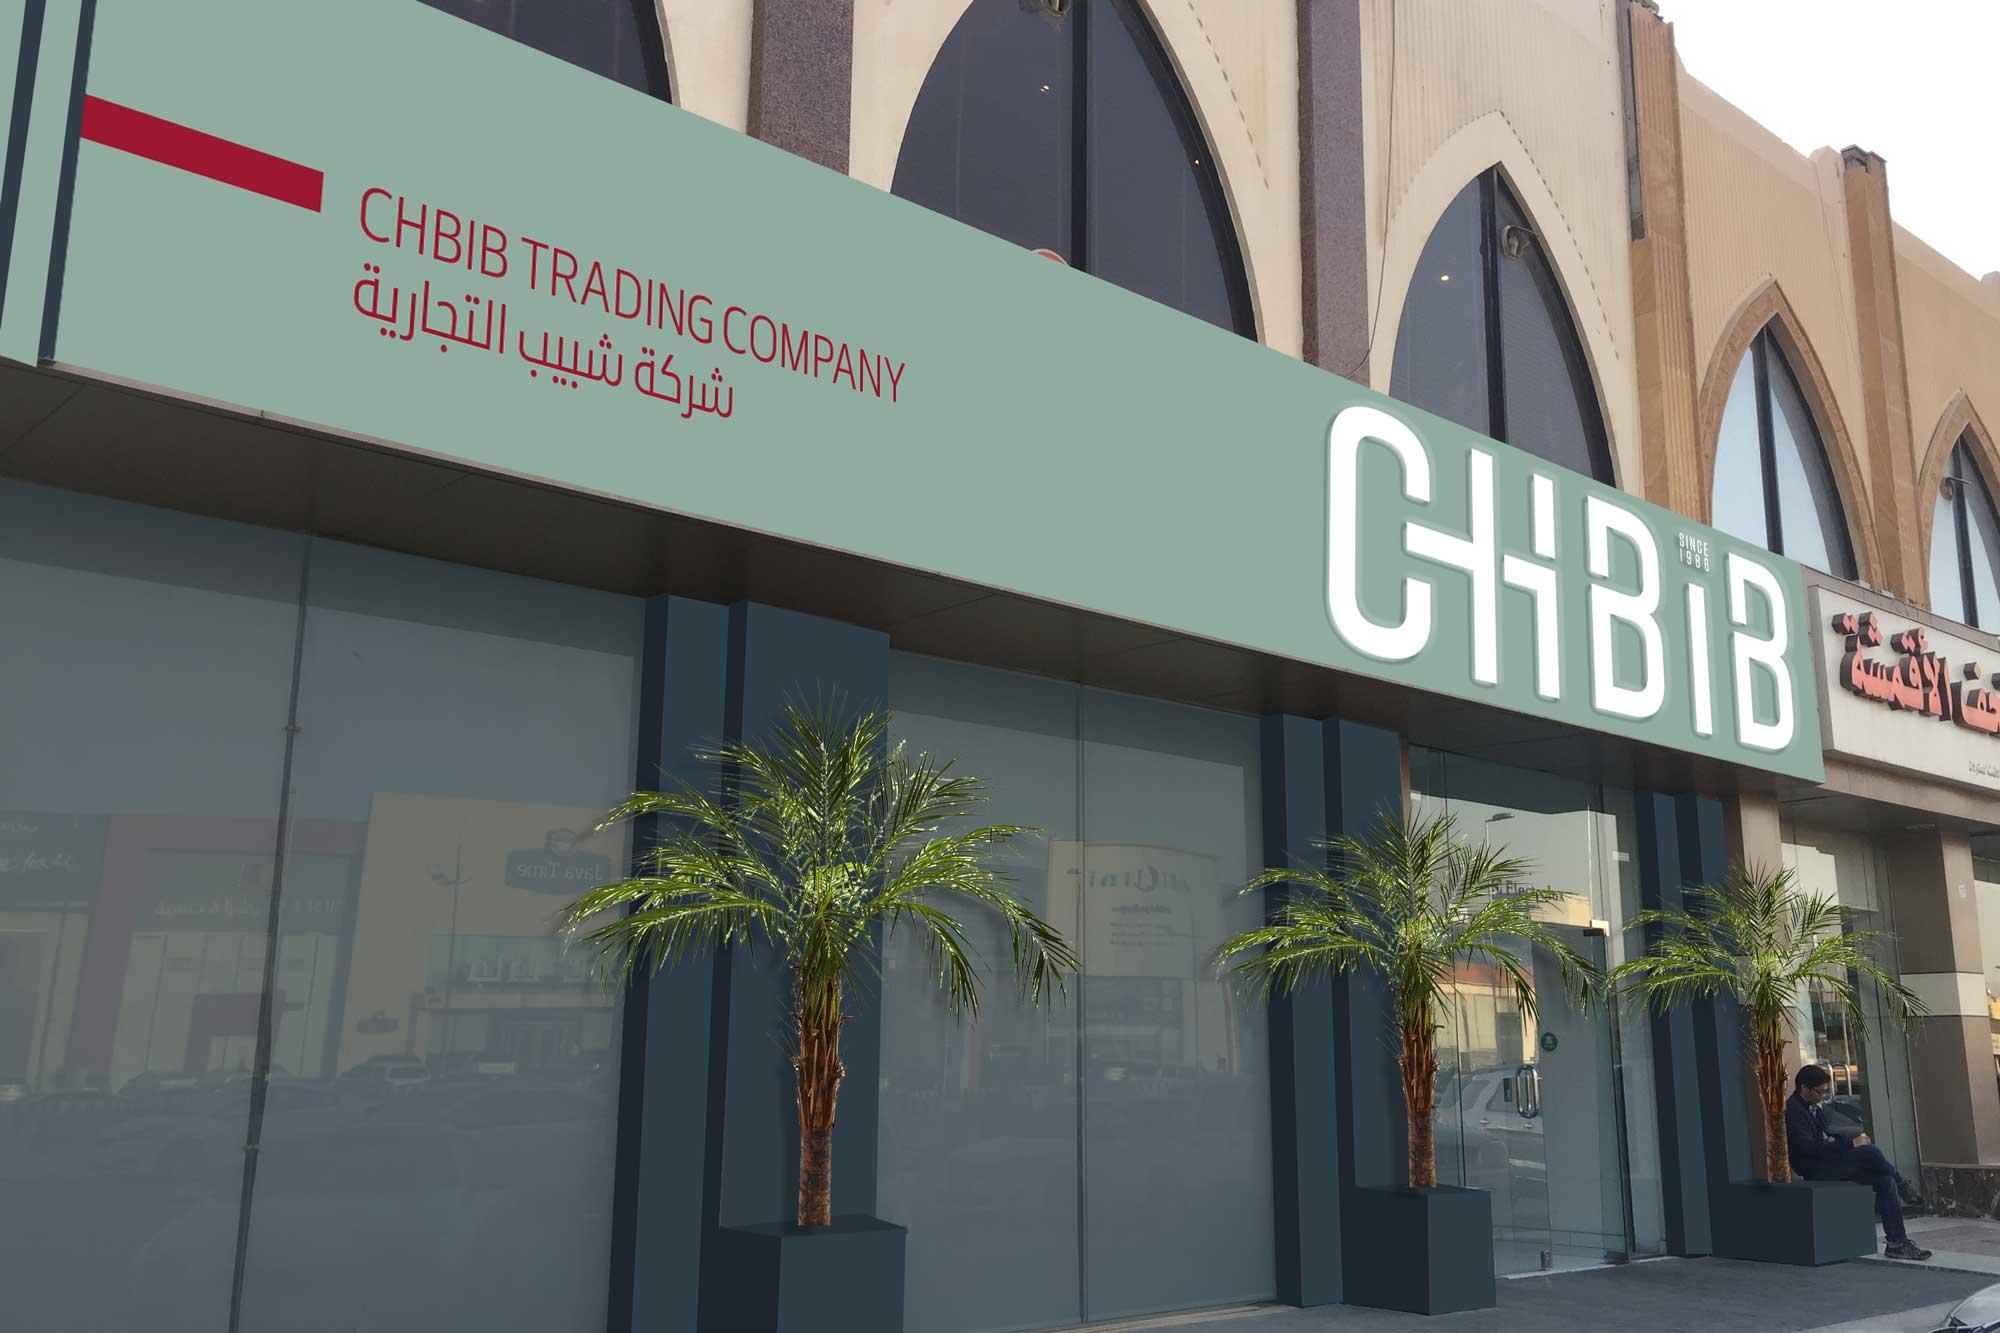 Chbib-Sign-03